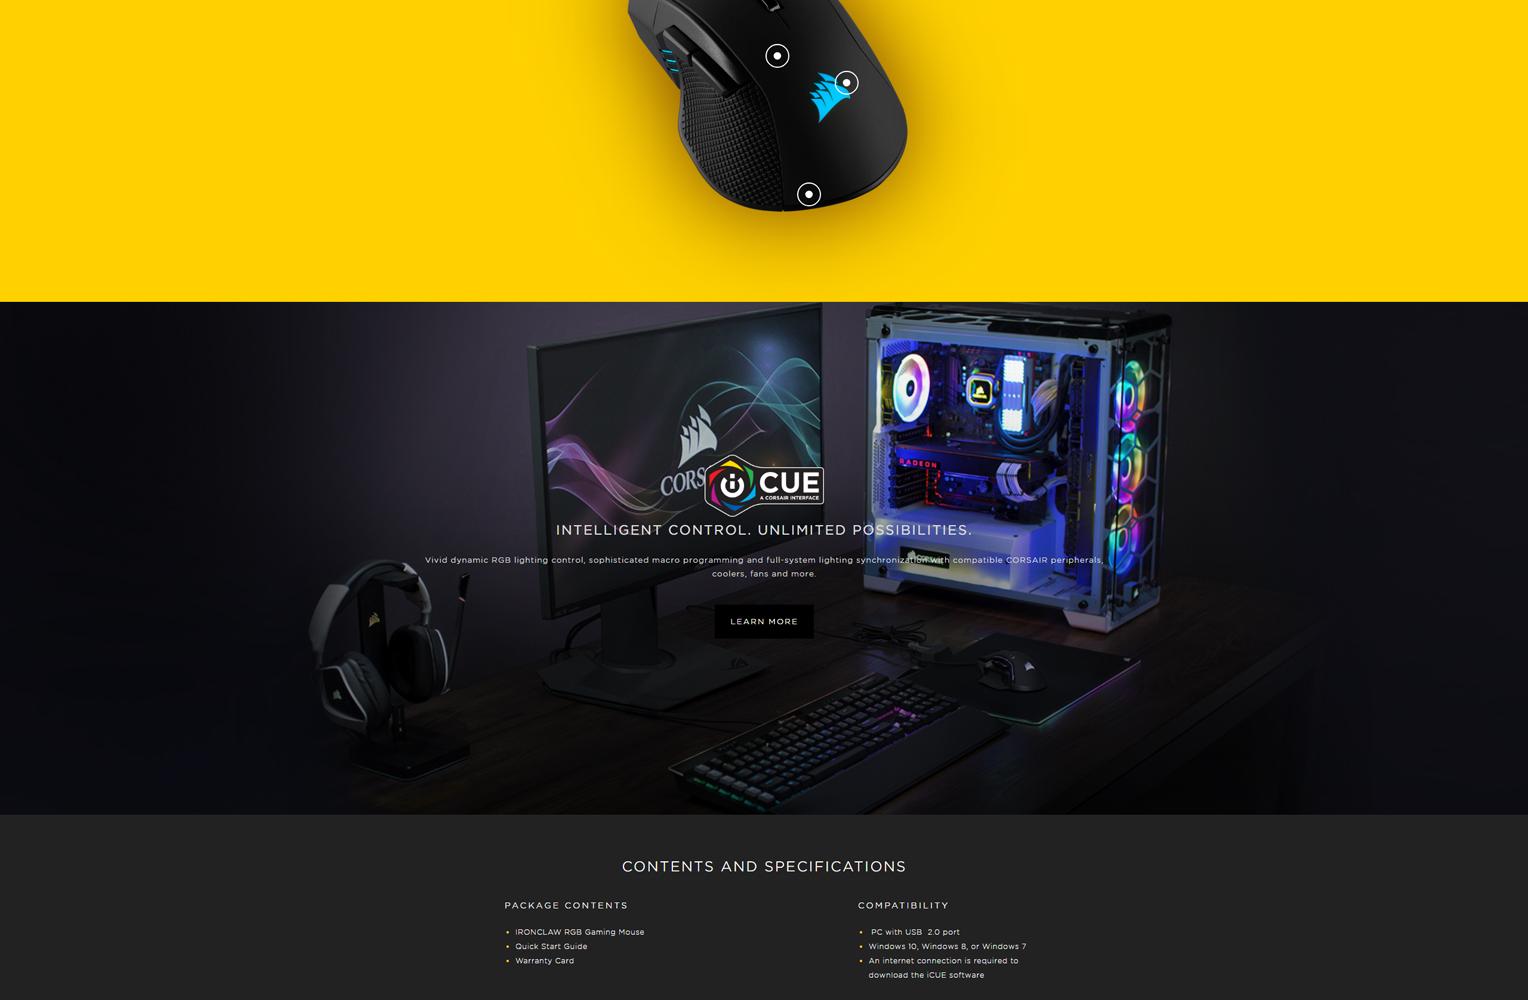 CORSAIR IRON CLAW RGB Gaming Mouse Singapore